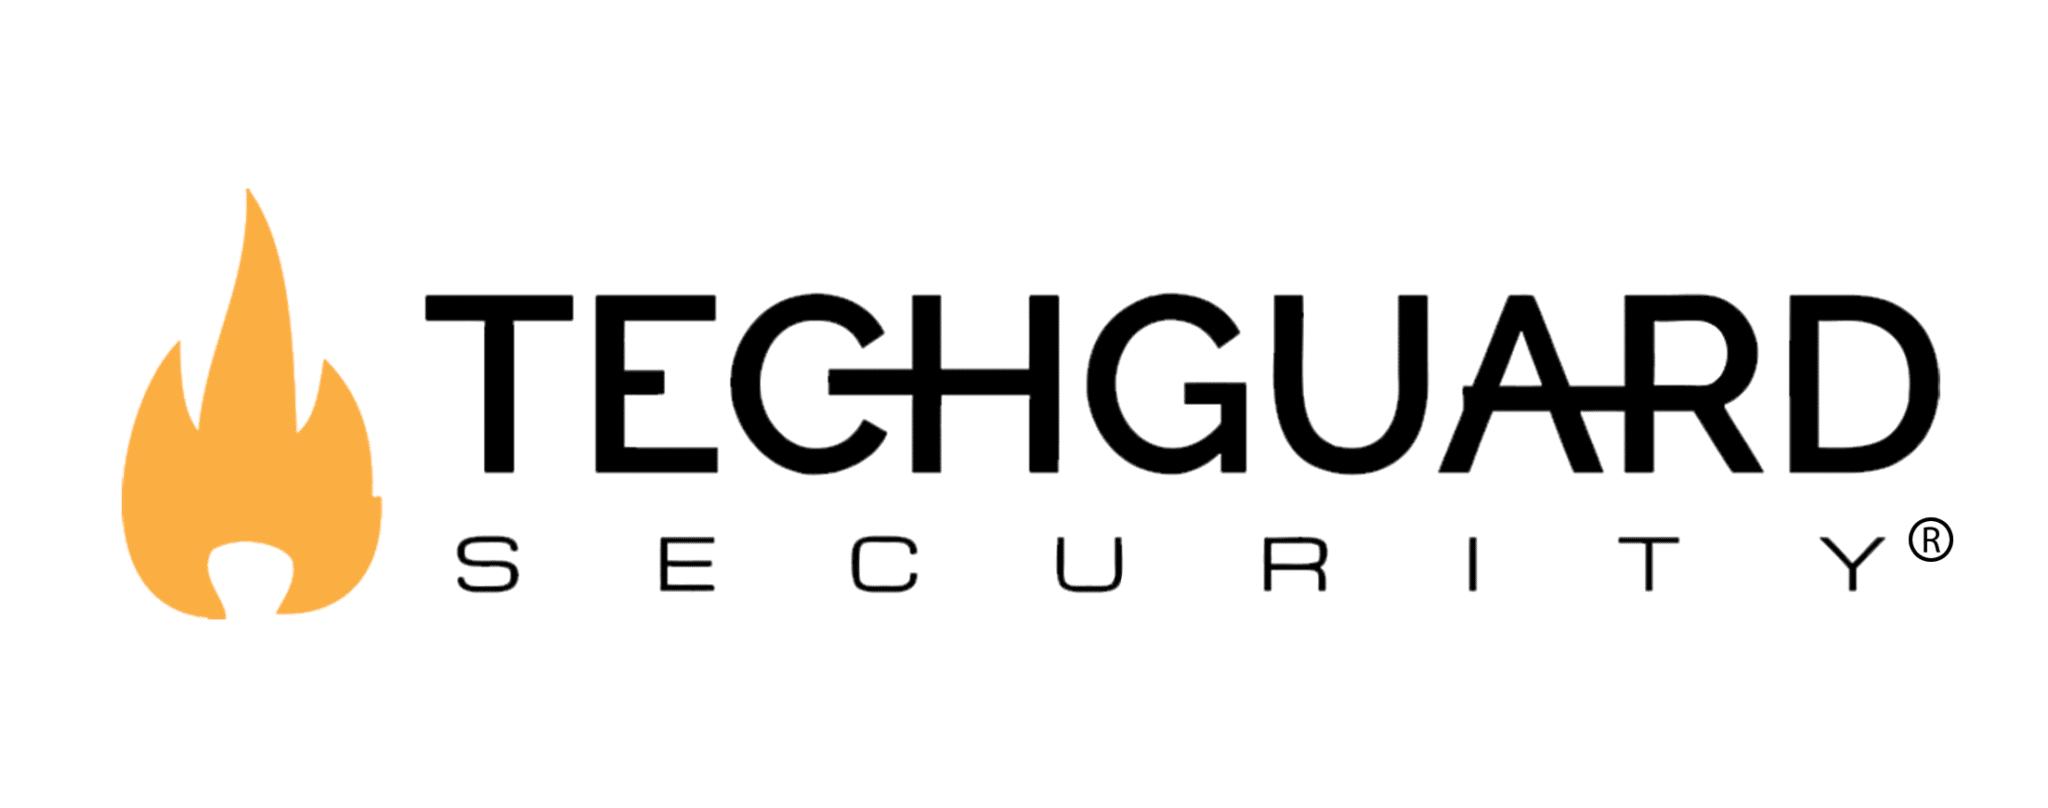 techguard_security_logo2019